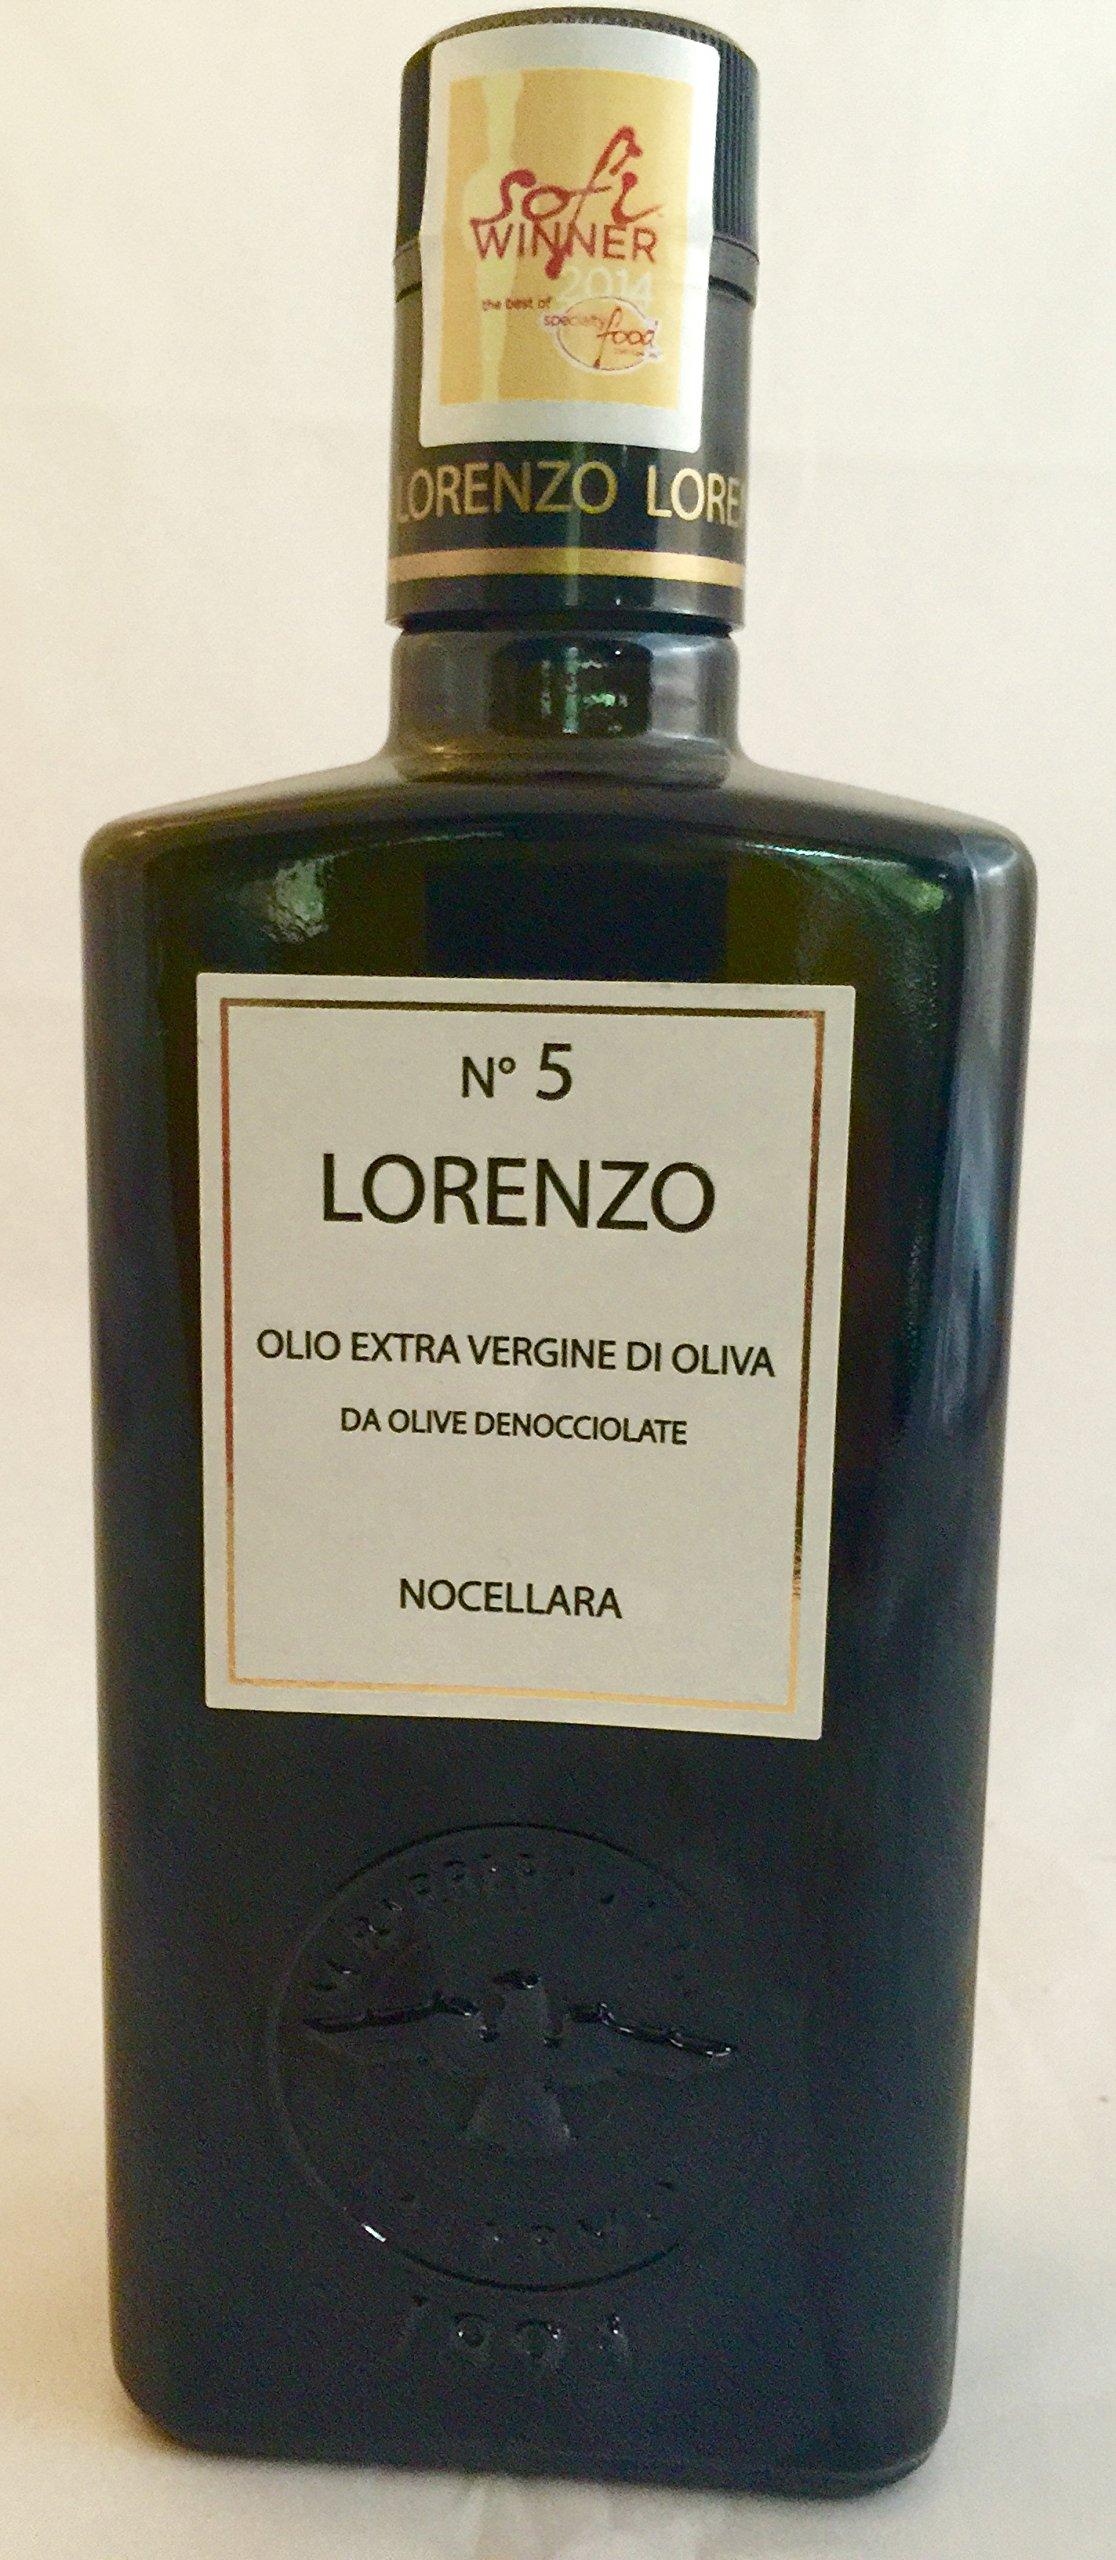 Barbera Lorenzo #5 (6 pack) Extra Virgin Olive Oil 500ml bottles from Sicily, Italy